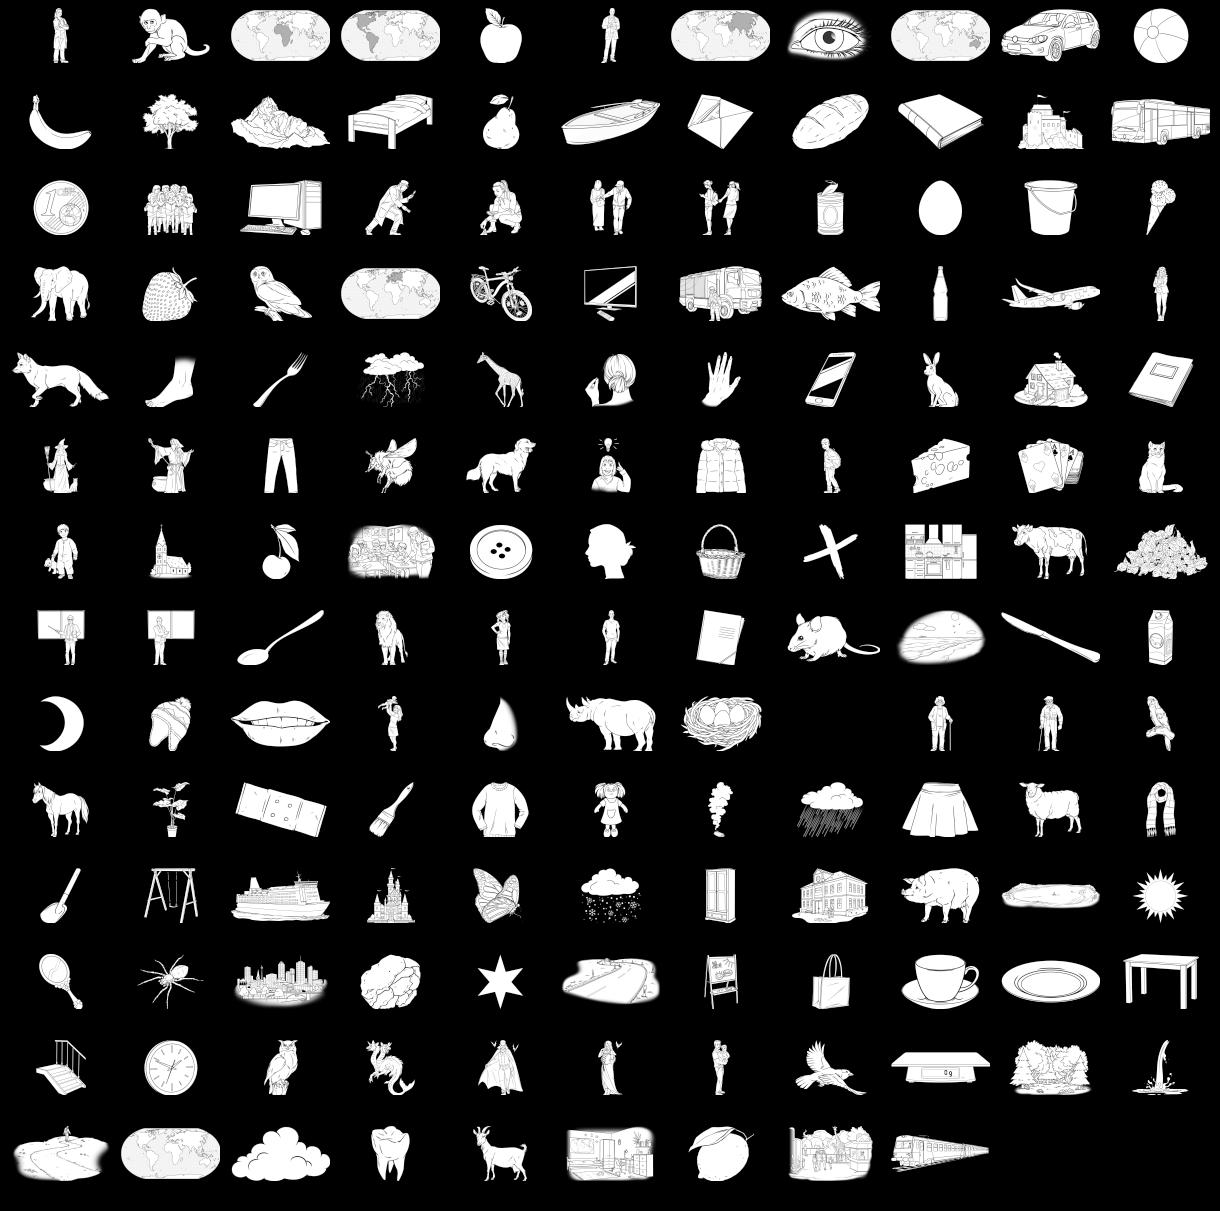 Thumbnails der Bilder der konkreten Nomen